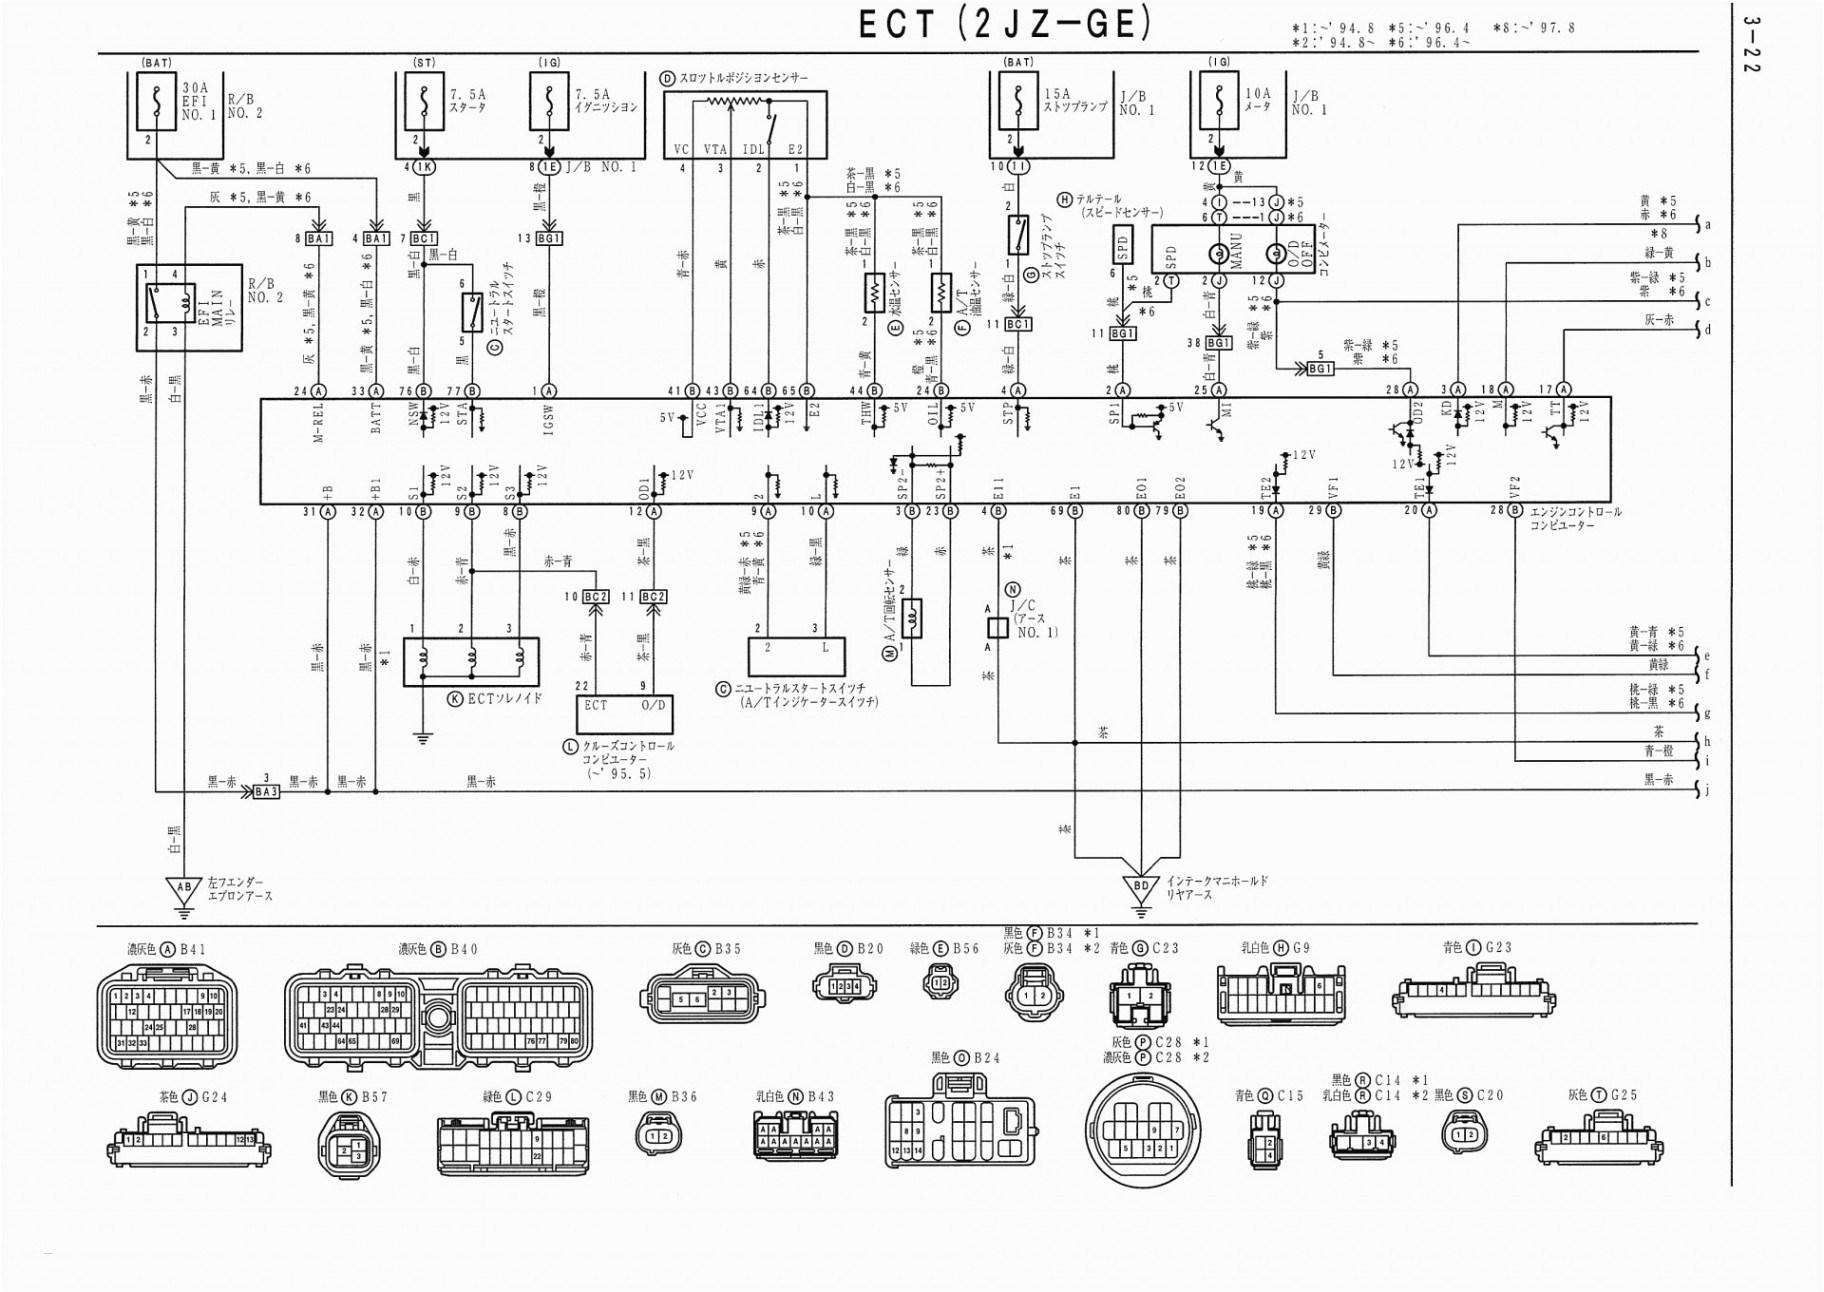 network wiring diagram wiring diagram with switch inspirational switch wiring diagram network switch diagram fresh web diagram 0d 7e jpg